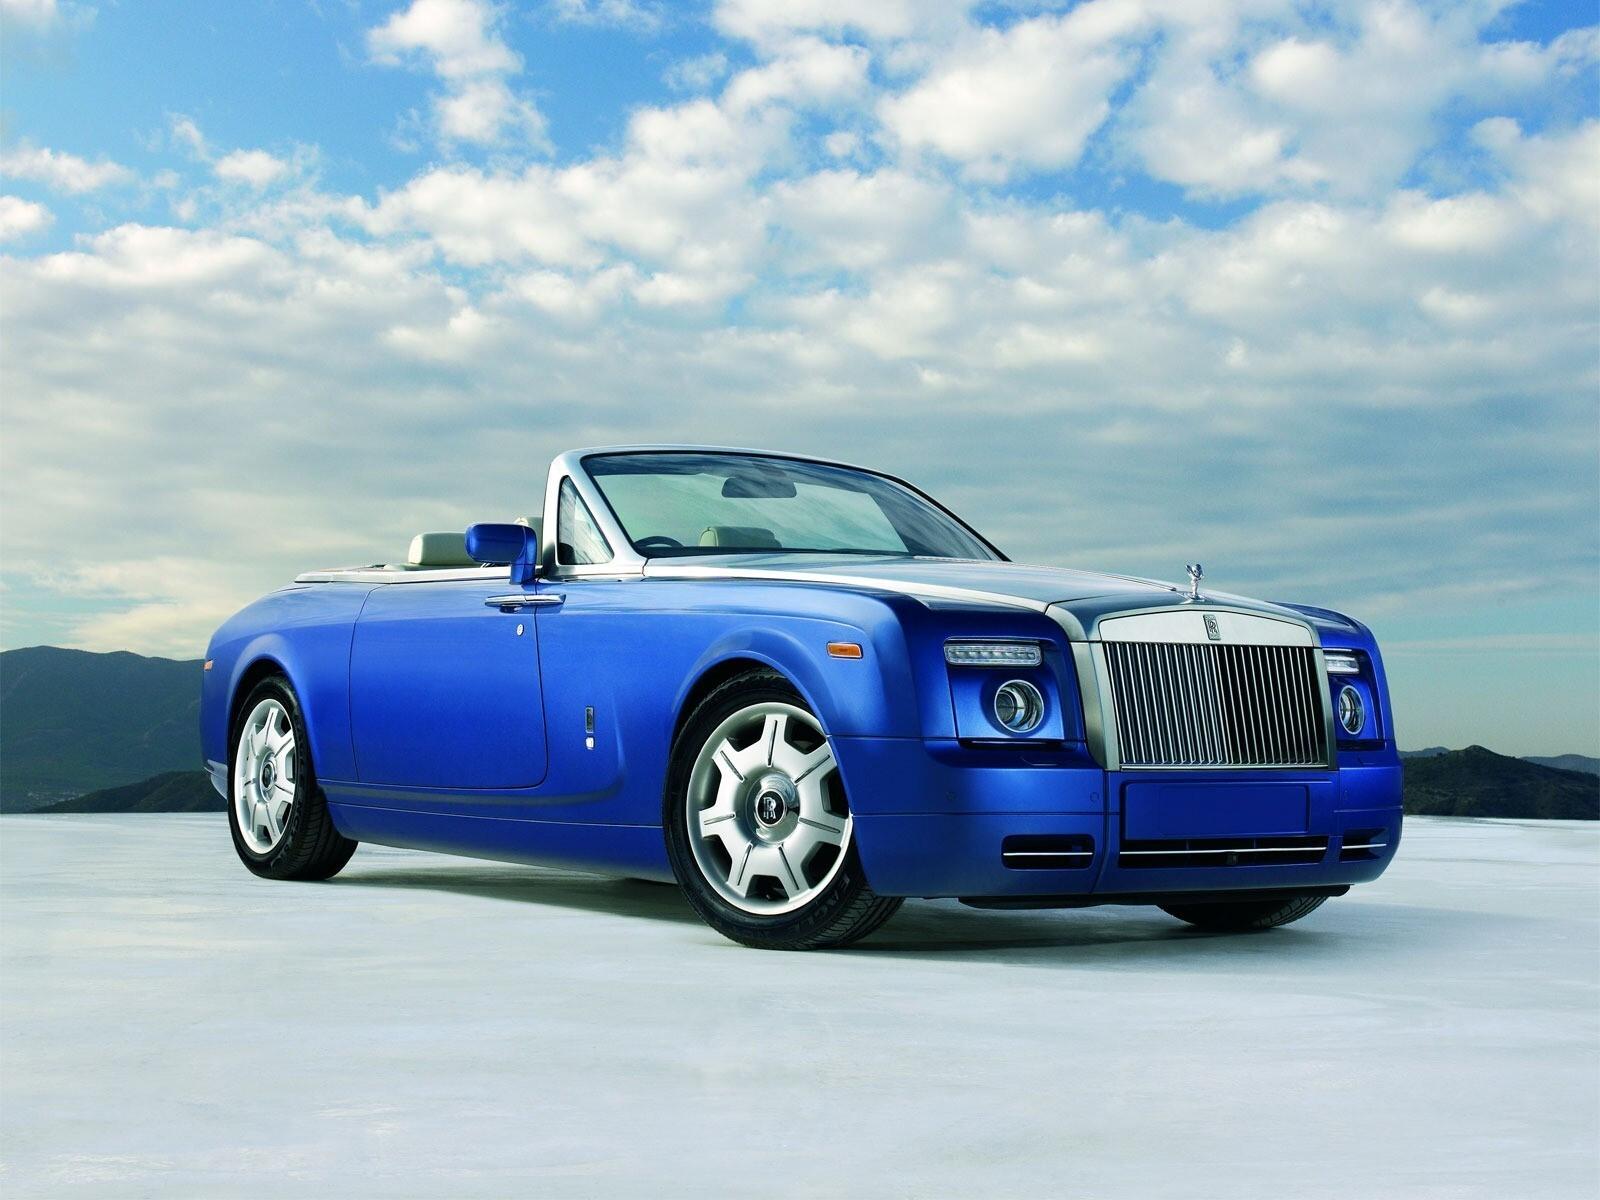 Rolls Royce Phantom Drophead Coupe Wallpaper   HD Wallpapers